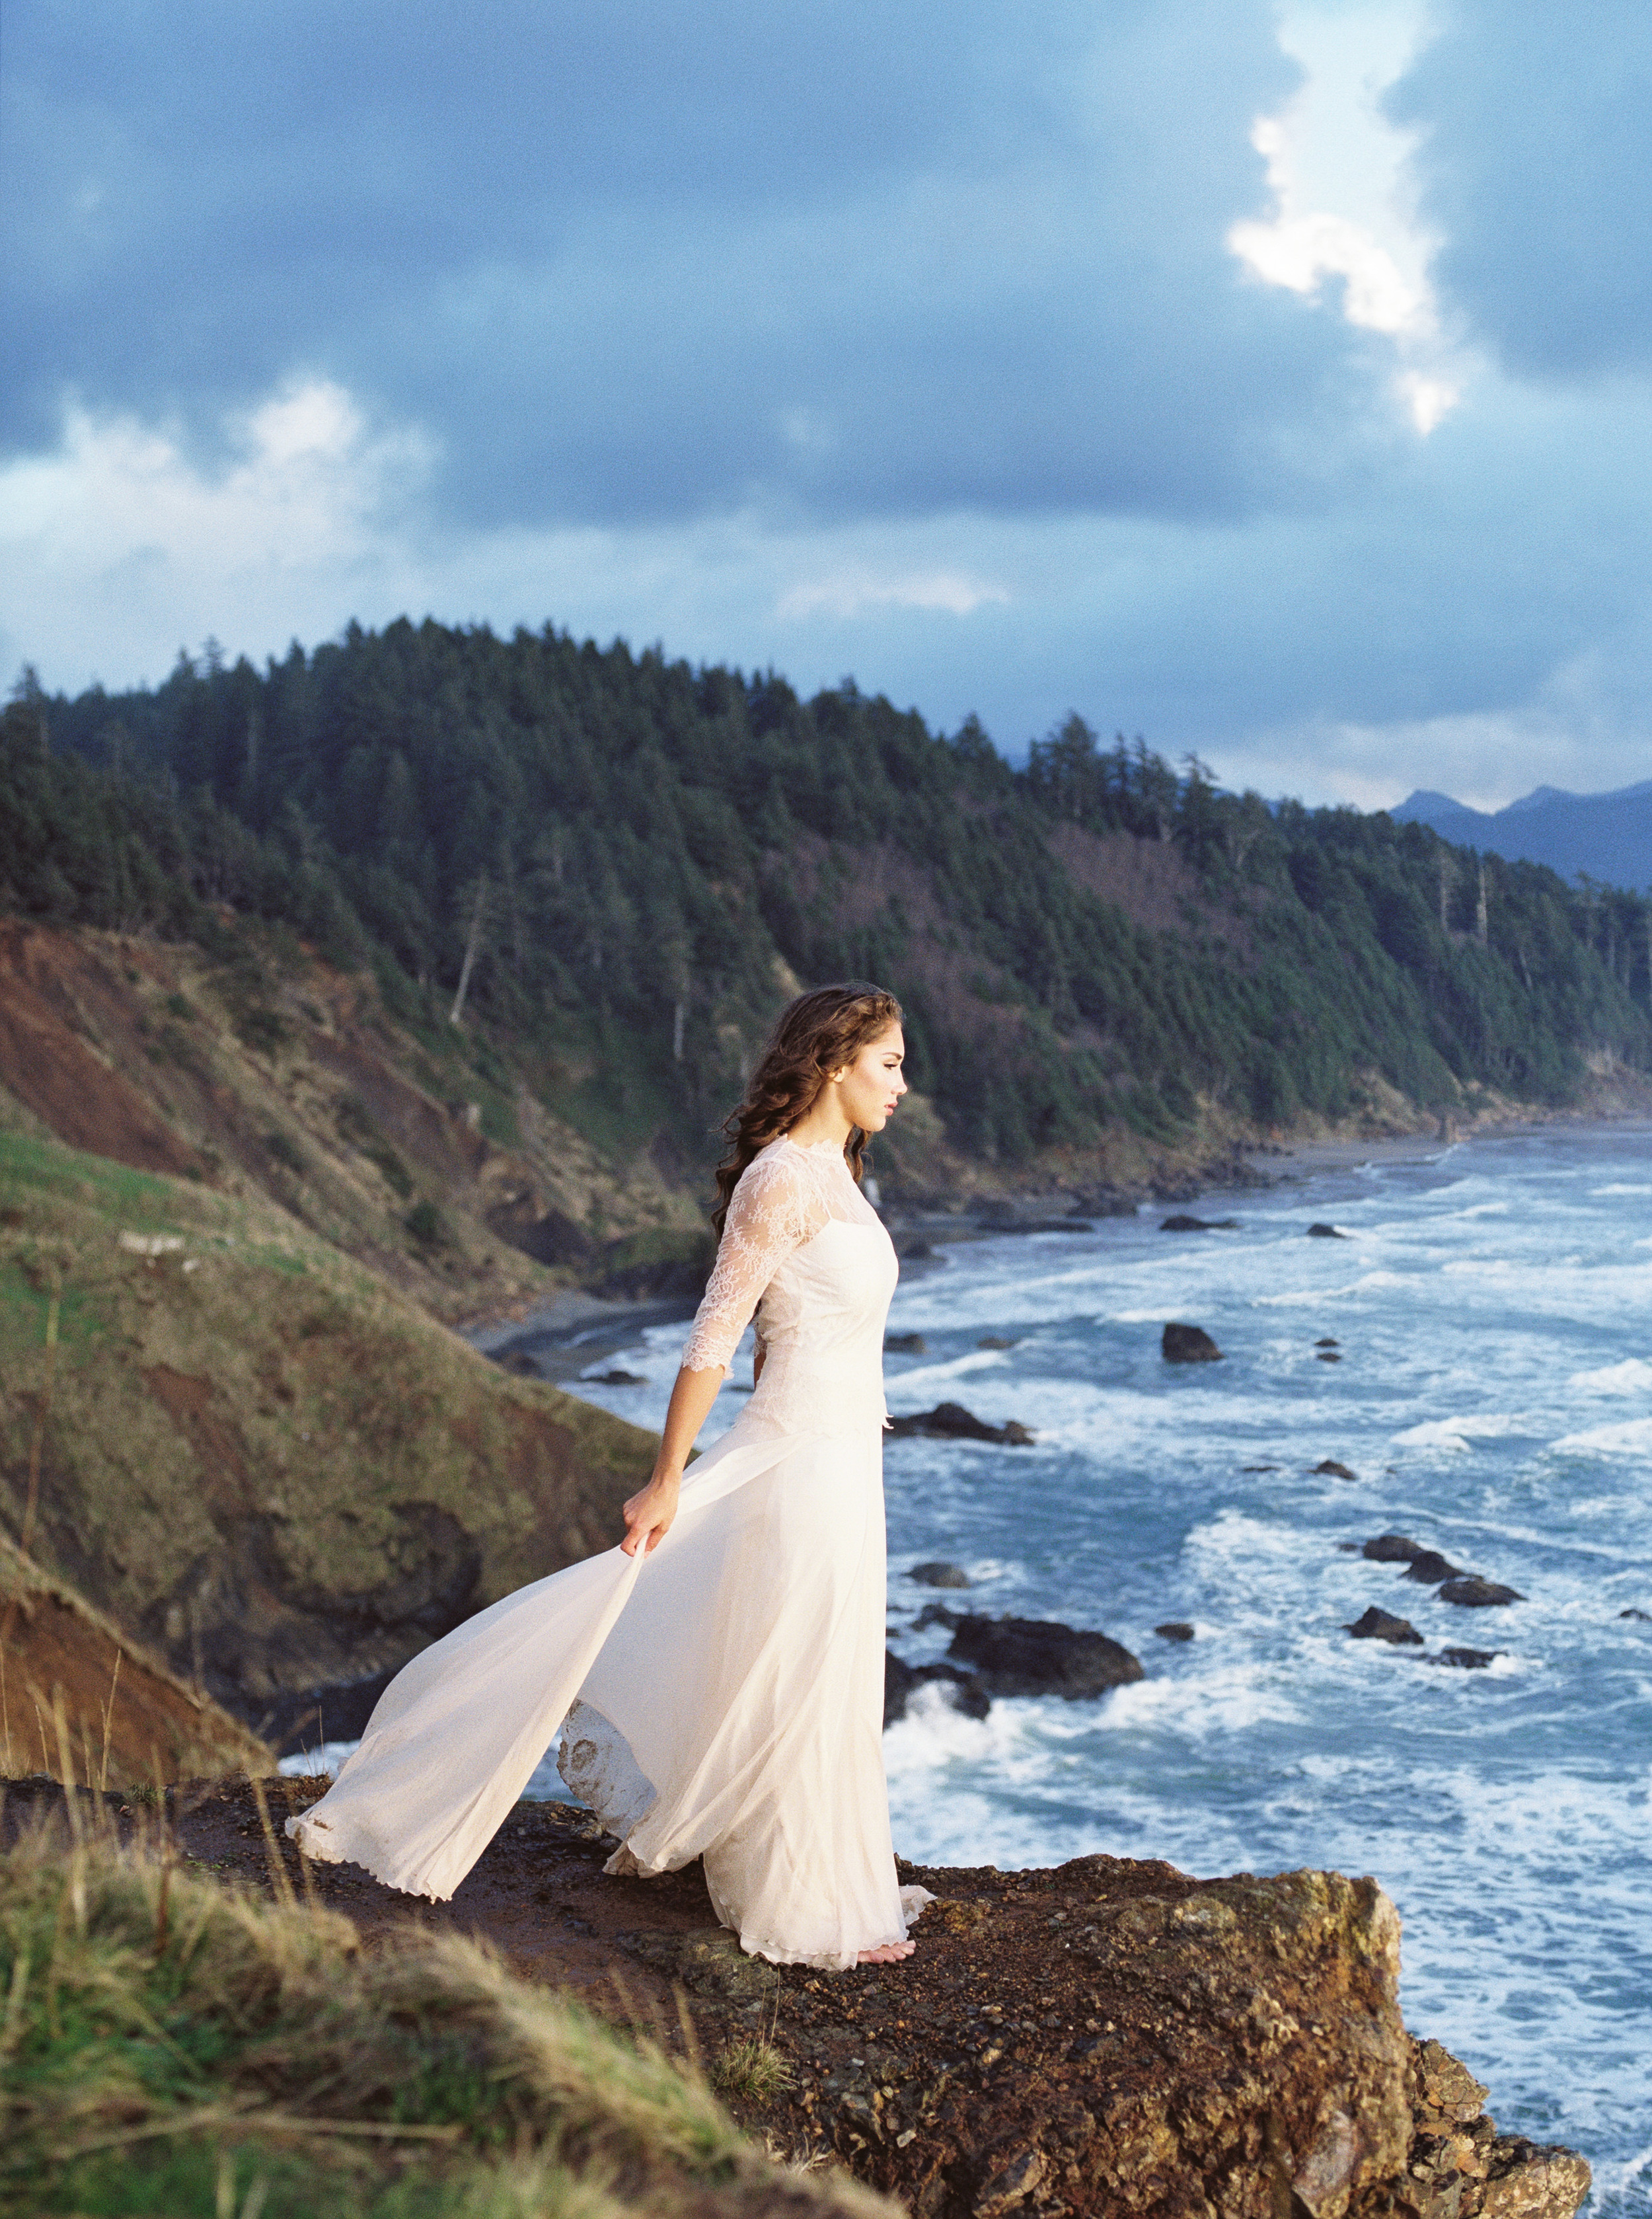 OregonCoastBridalsfilm (9 of 18).jpg